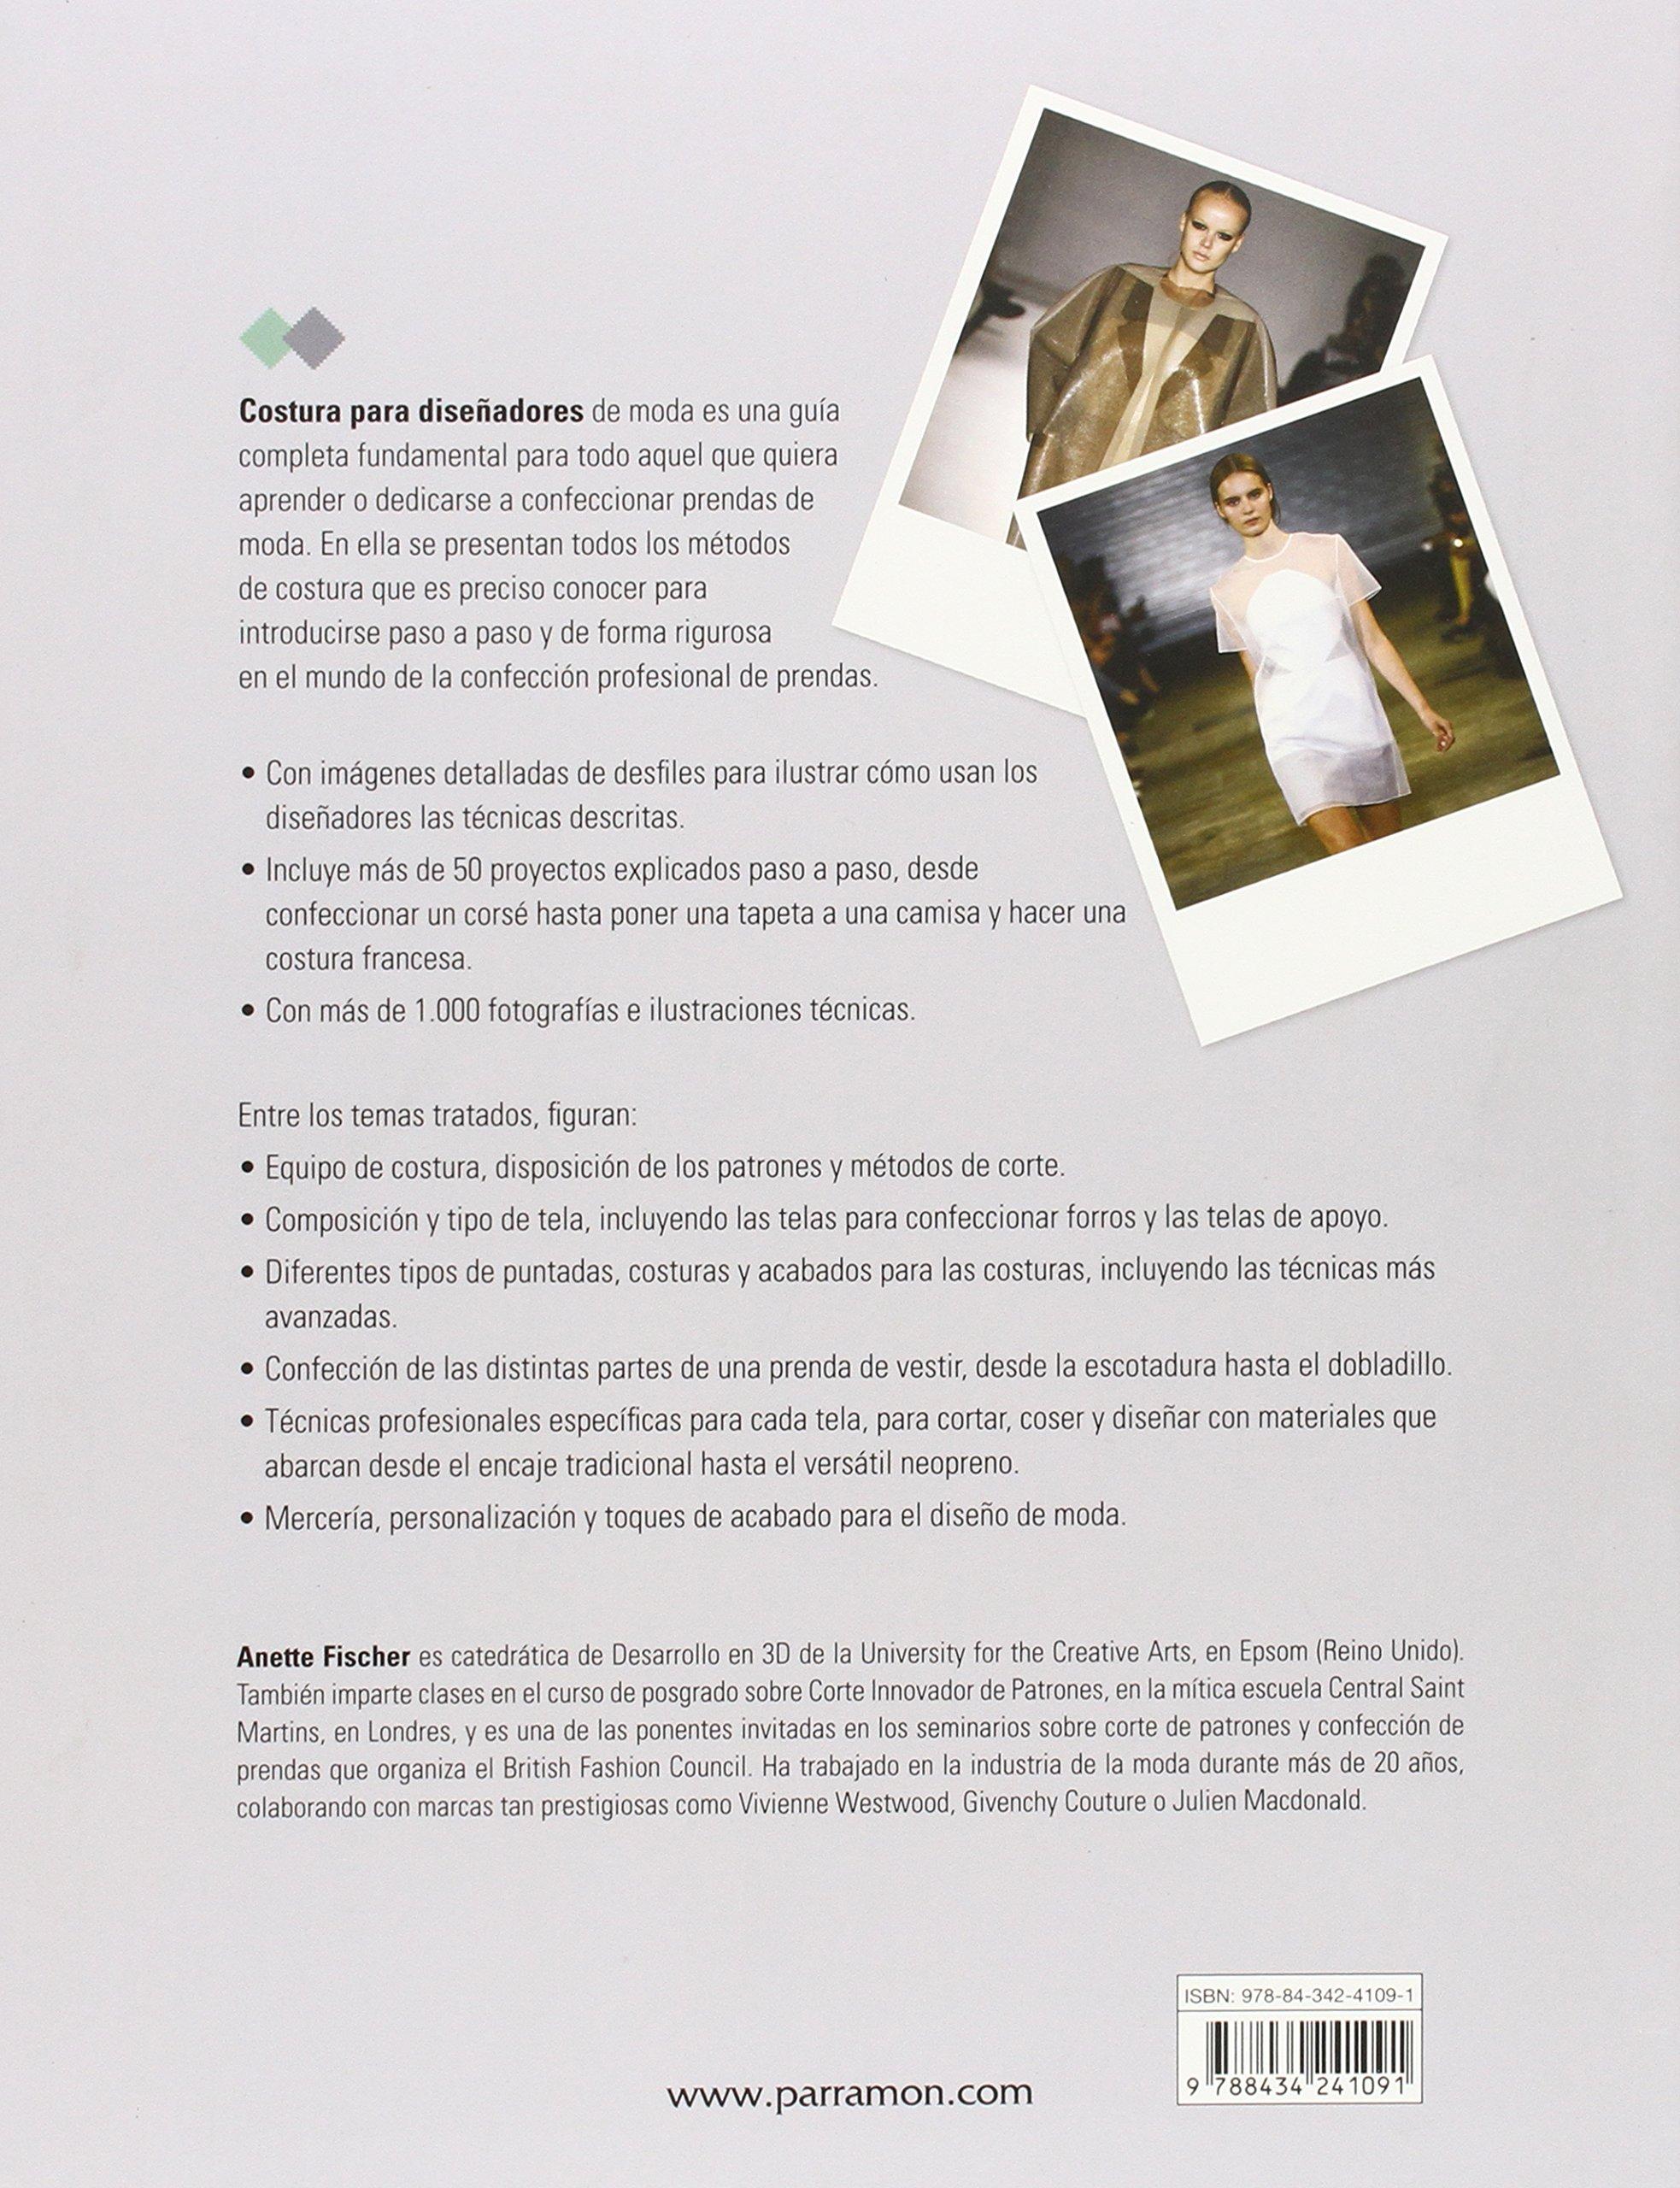 Costura Para Diseñadores De Moda: Amazon.es: Anette Fischer: Libros